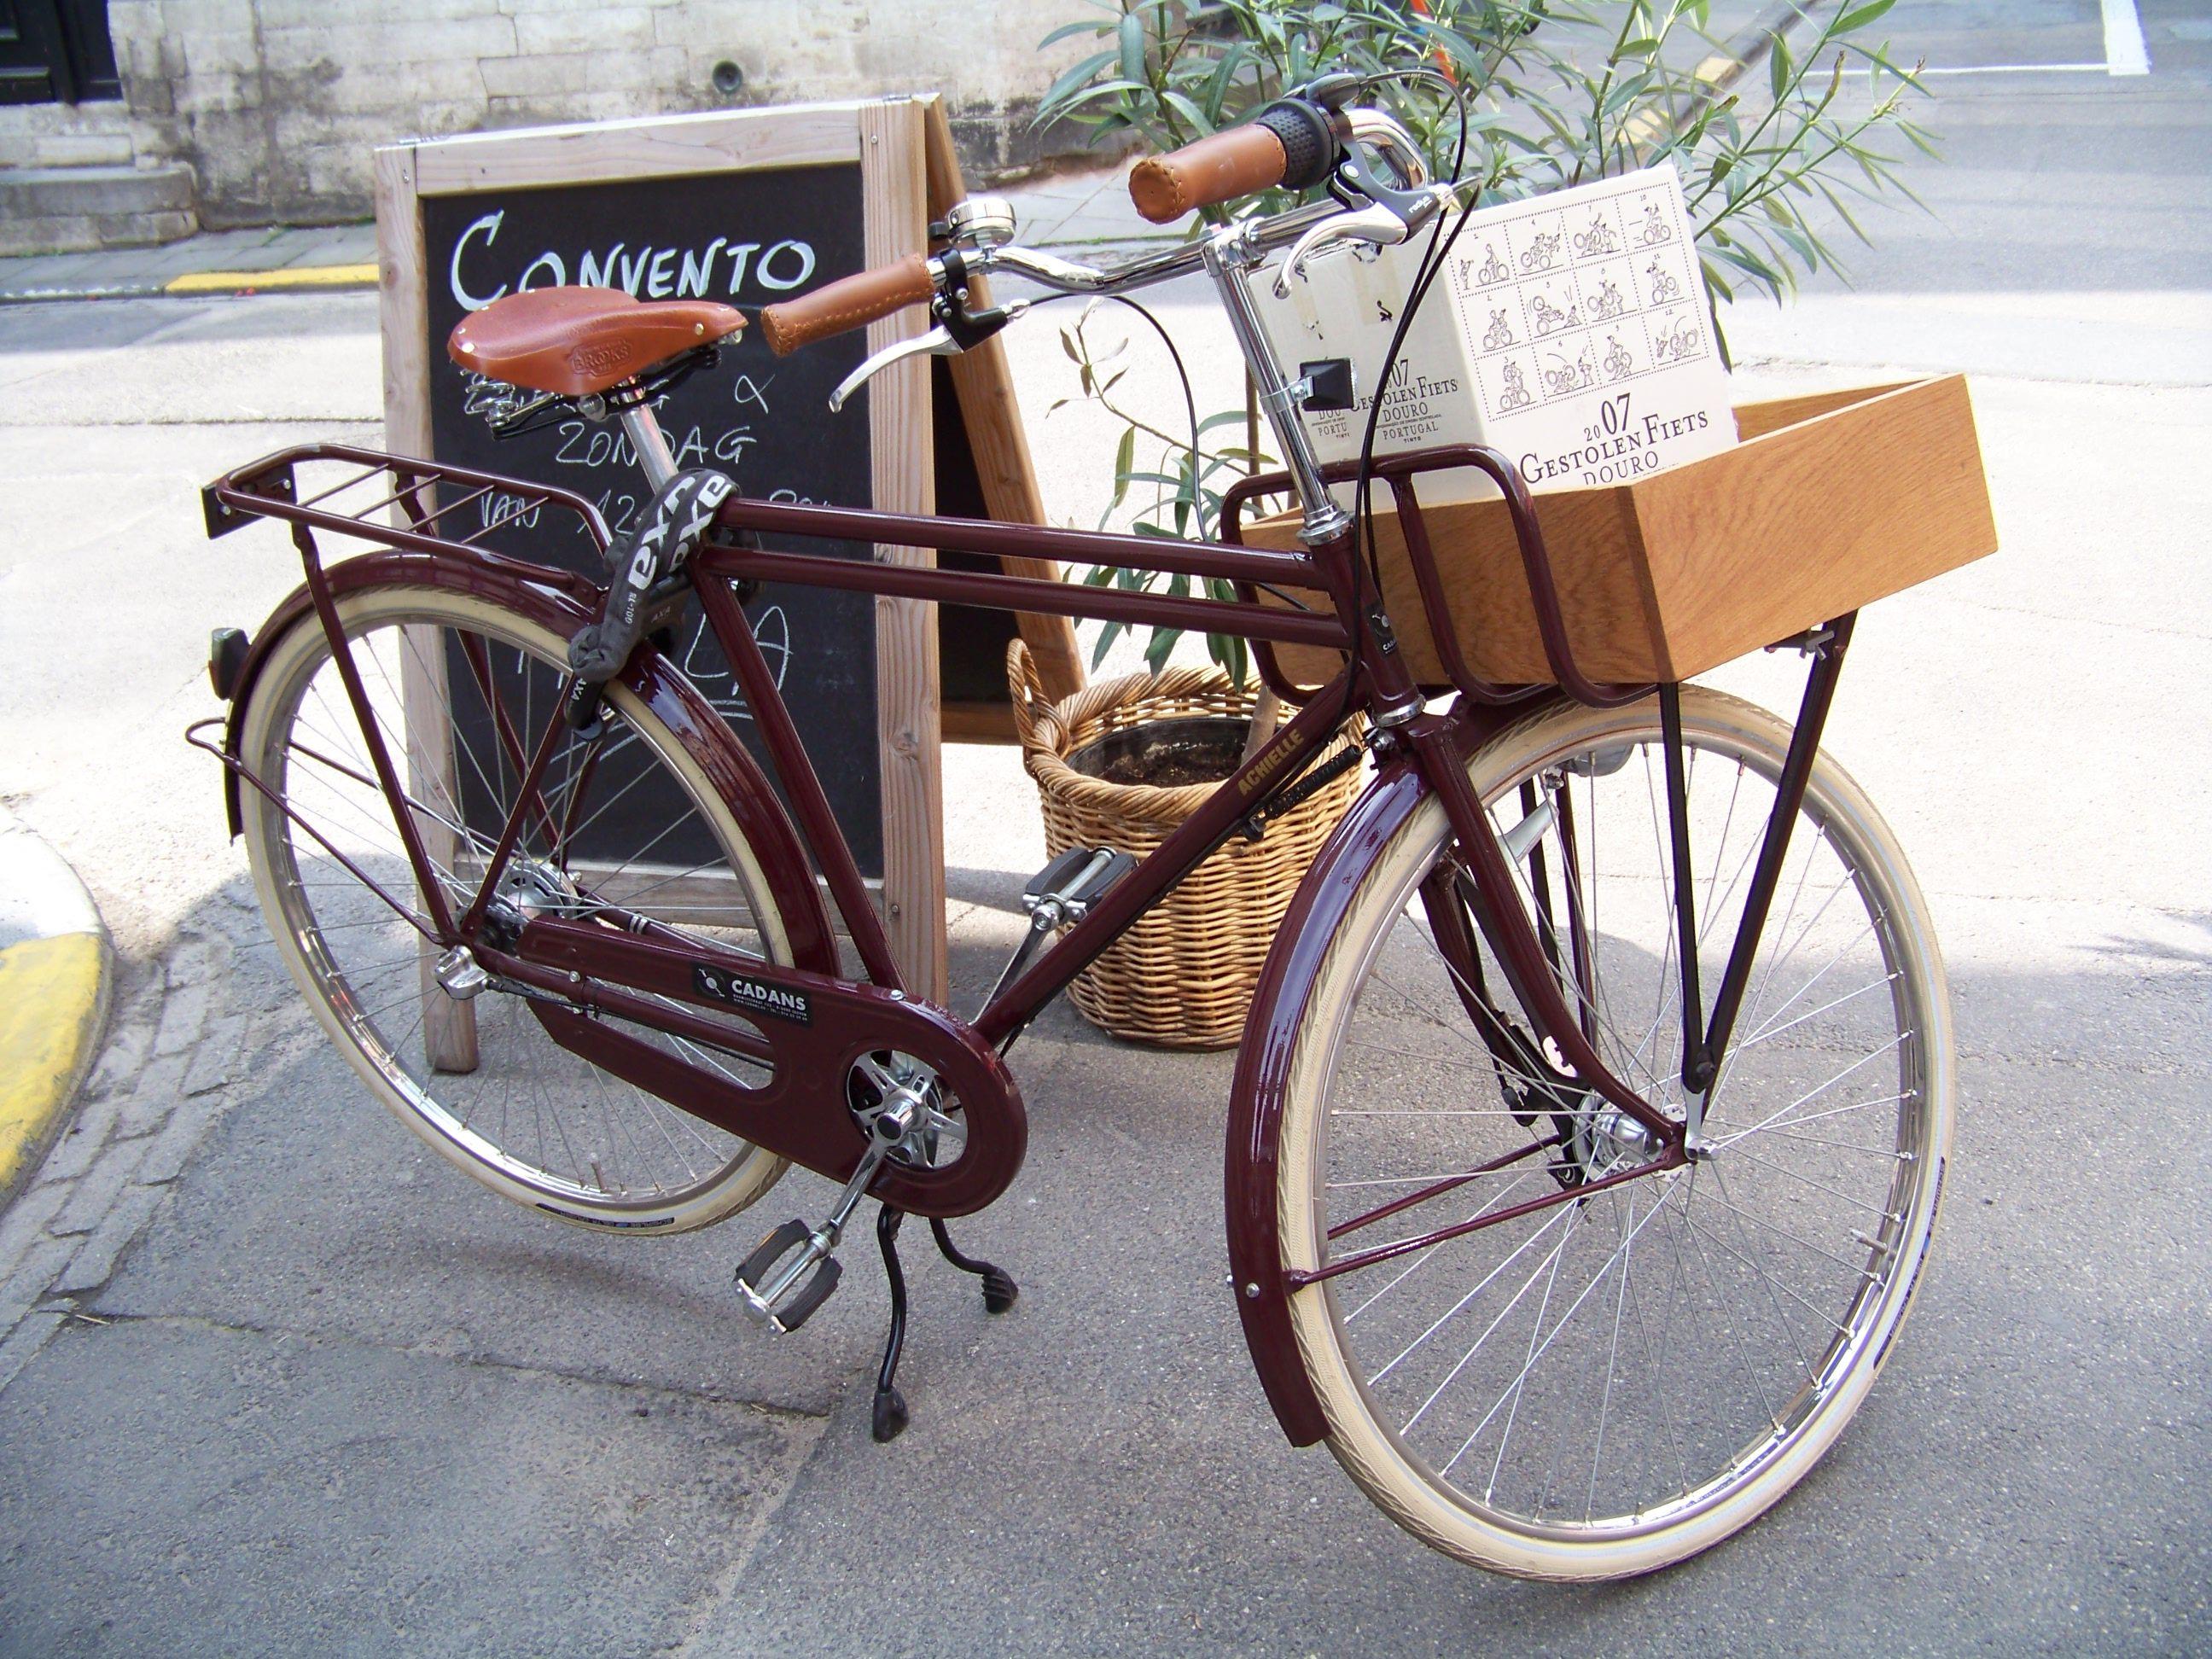 Achielle transporter bike | Sonstiges | Pinterest | Bicycling